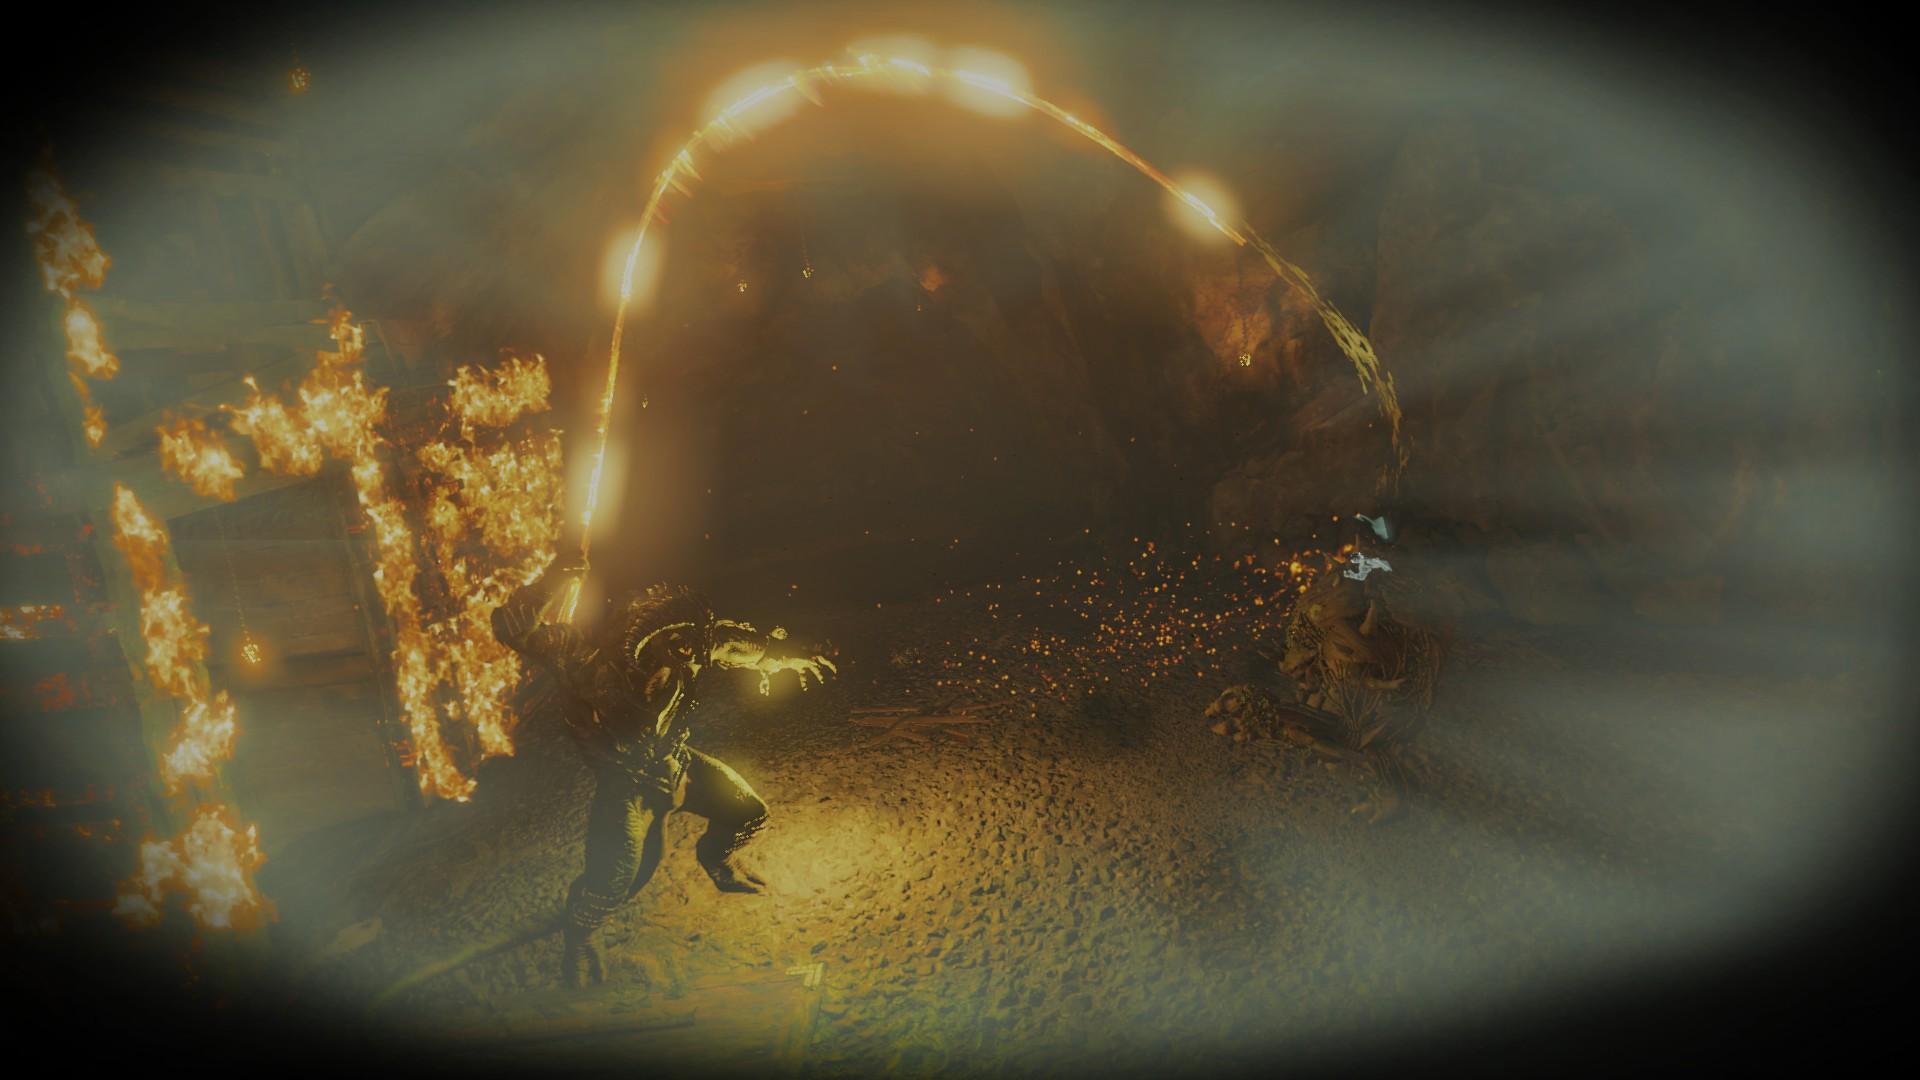 Wallpaper Middle Earth Shadow Of War Mordor Tar Goroth 1920x1080 Mysweetsgone 1393327 Hd Wallpapers Wallhere